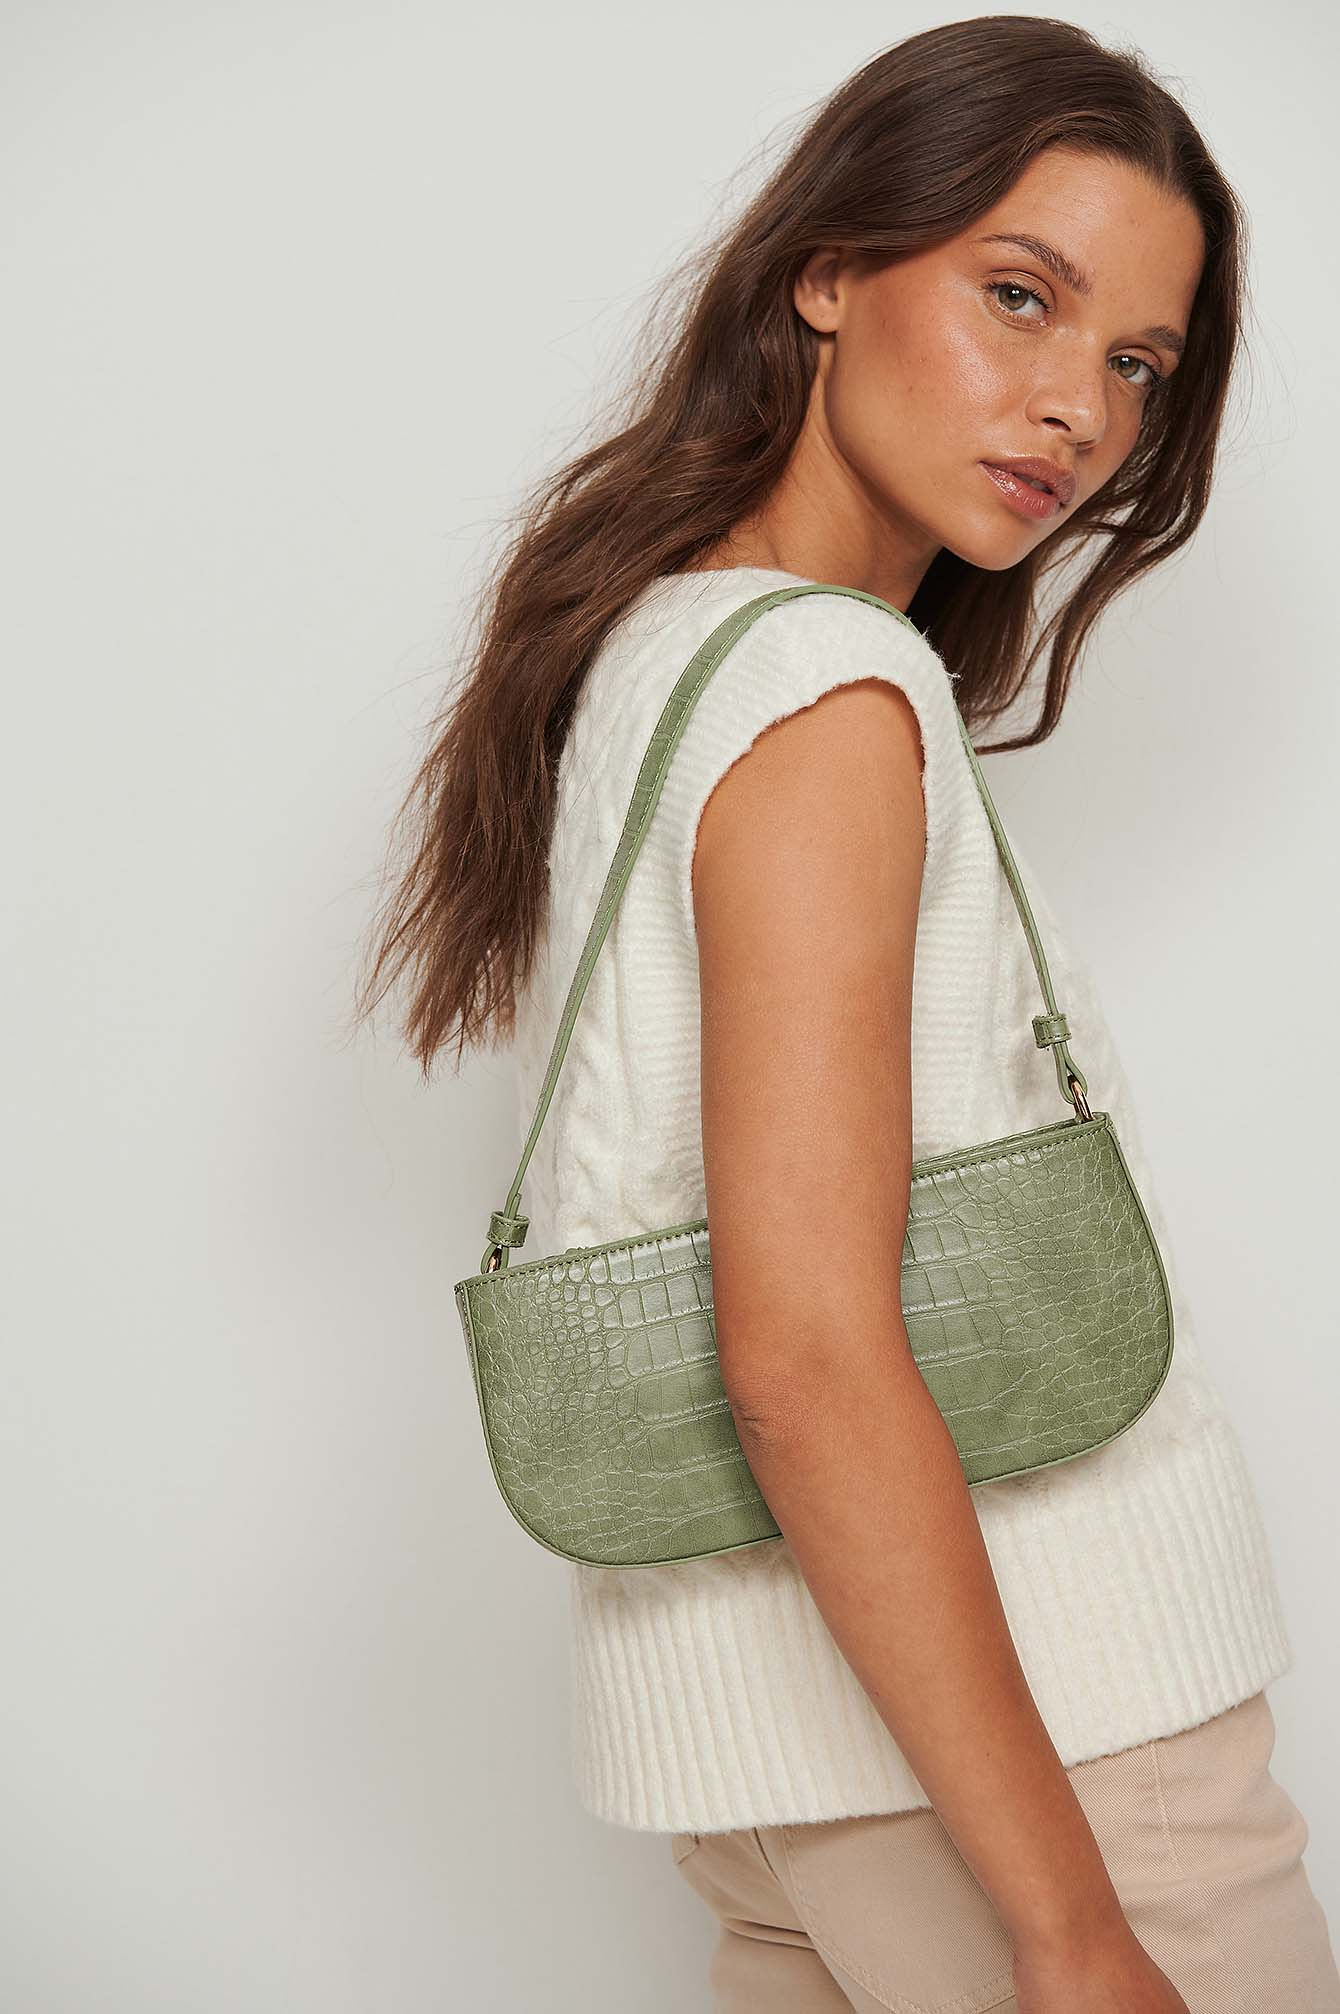 NA-KD Accessories Reptile Baguette Bag - Green